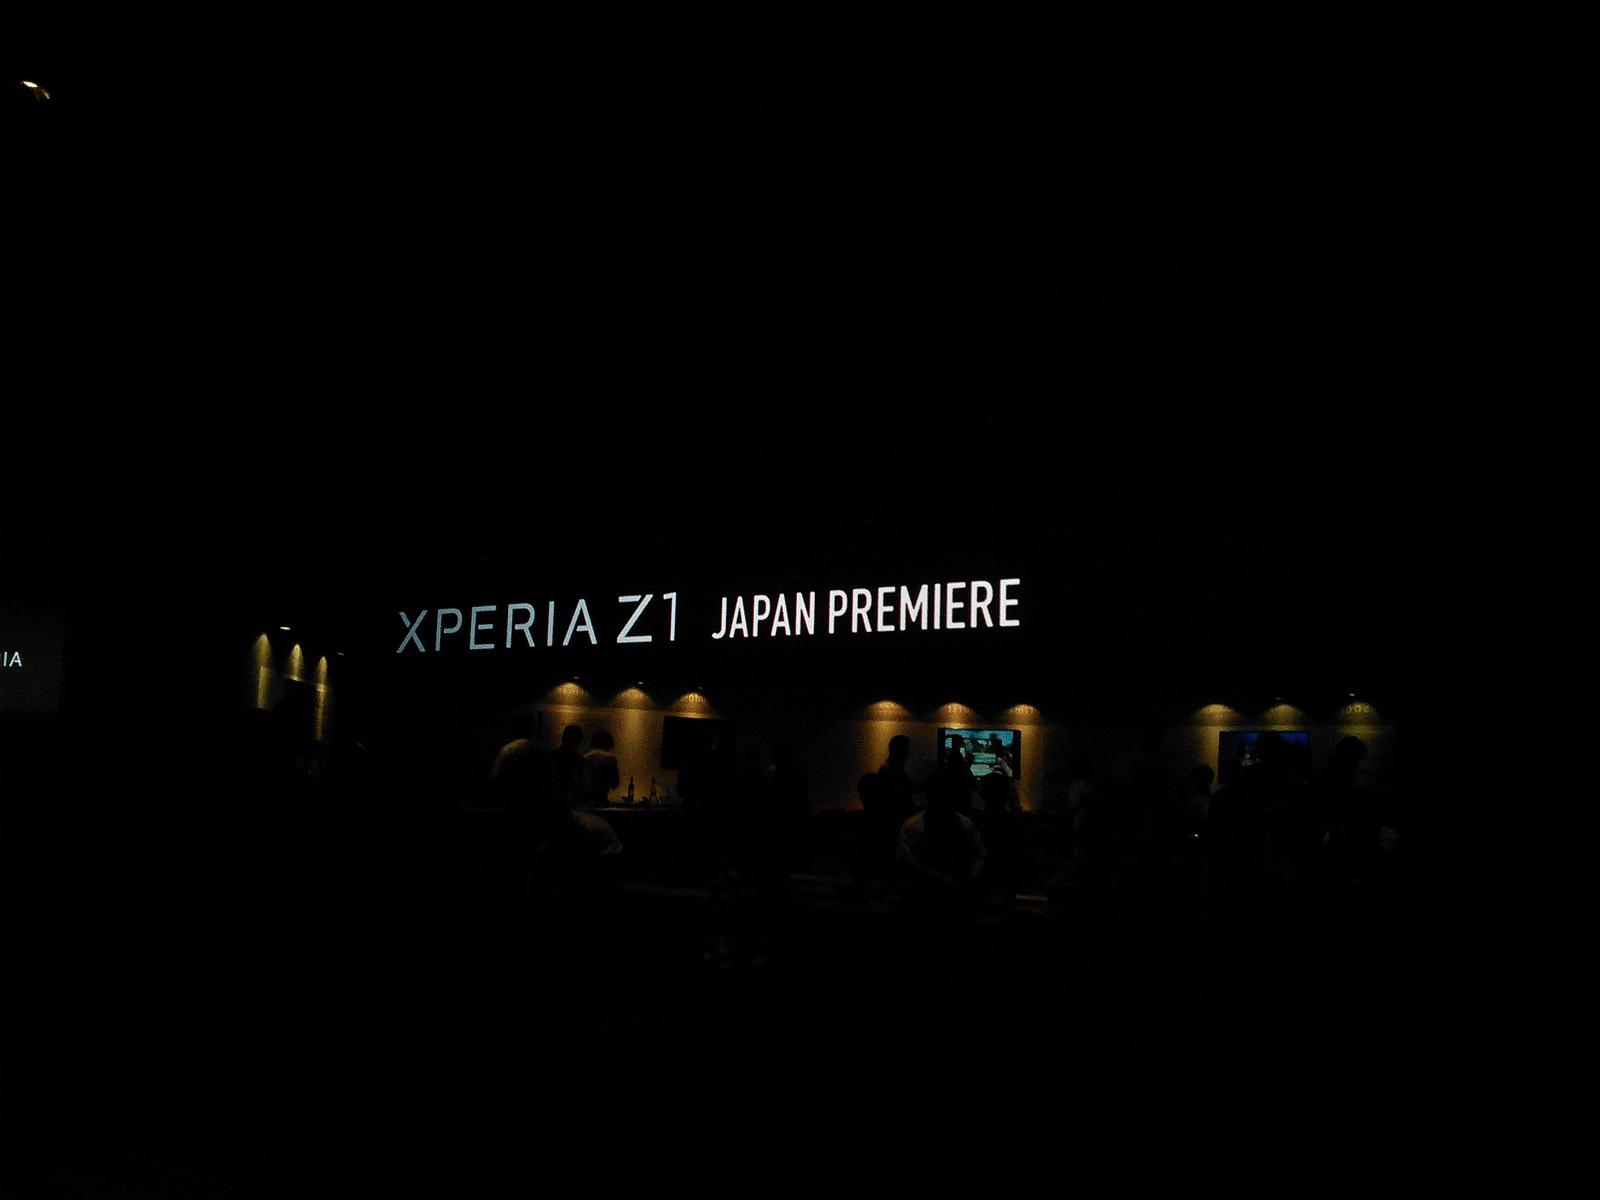 Xperia Z1のタッチ&トライイベントに行ってきた!